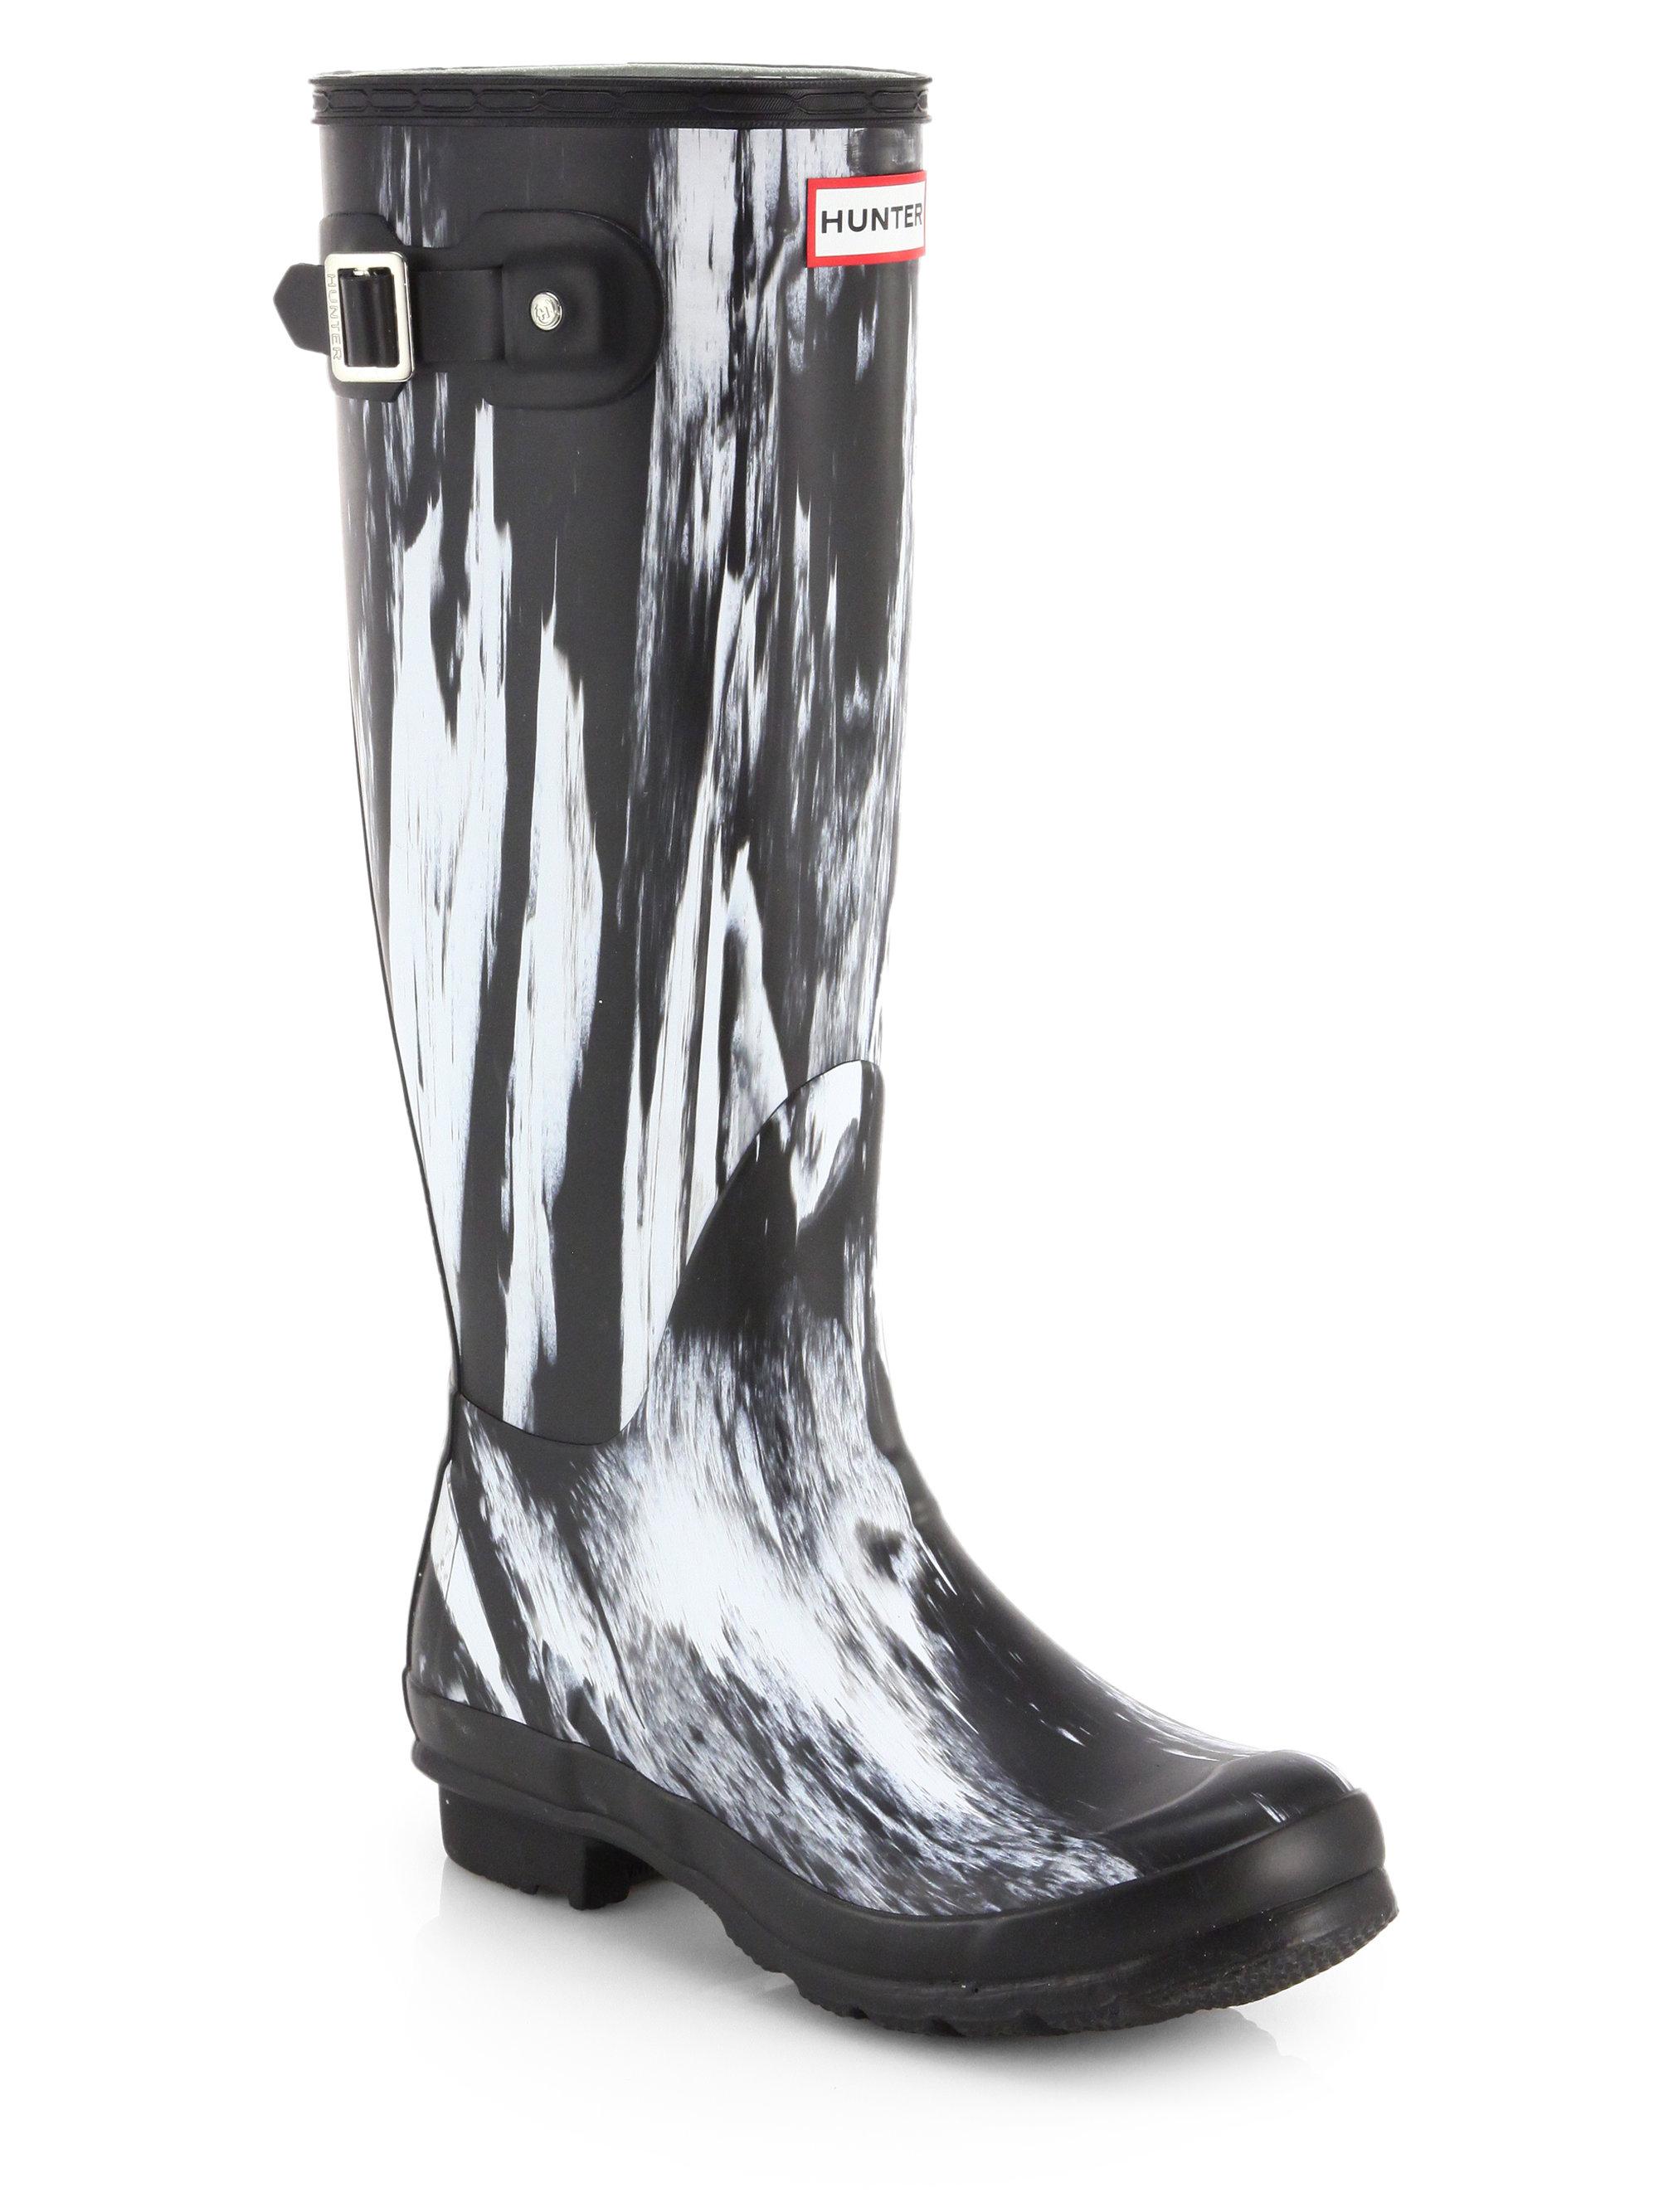 Lyst - Hunter Original Nightfall Wellington Boots In Black-9729